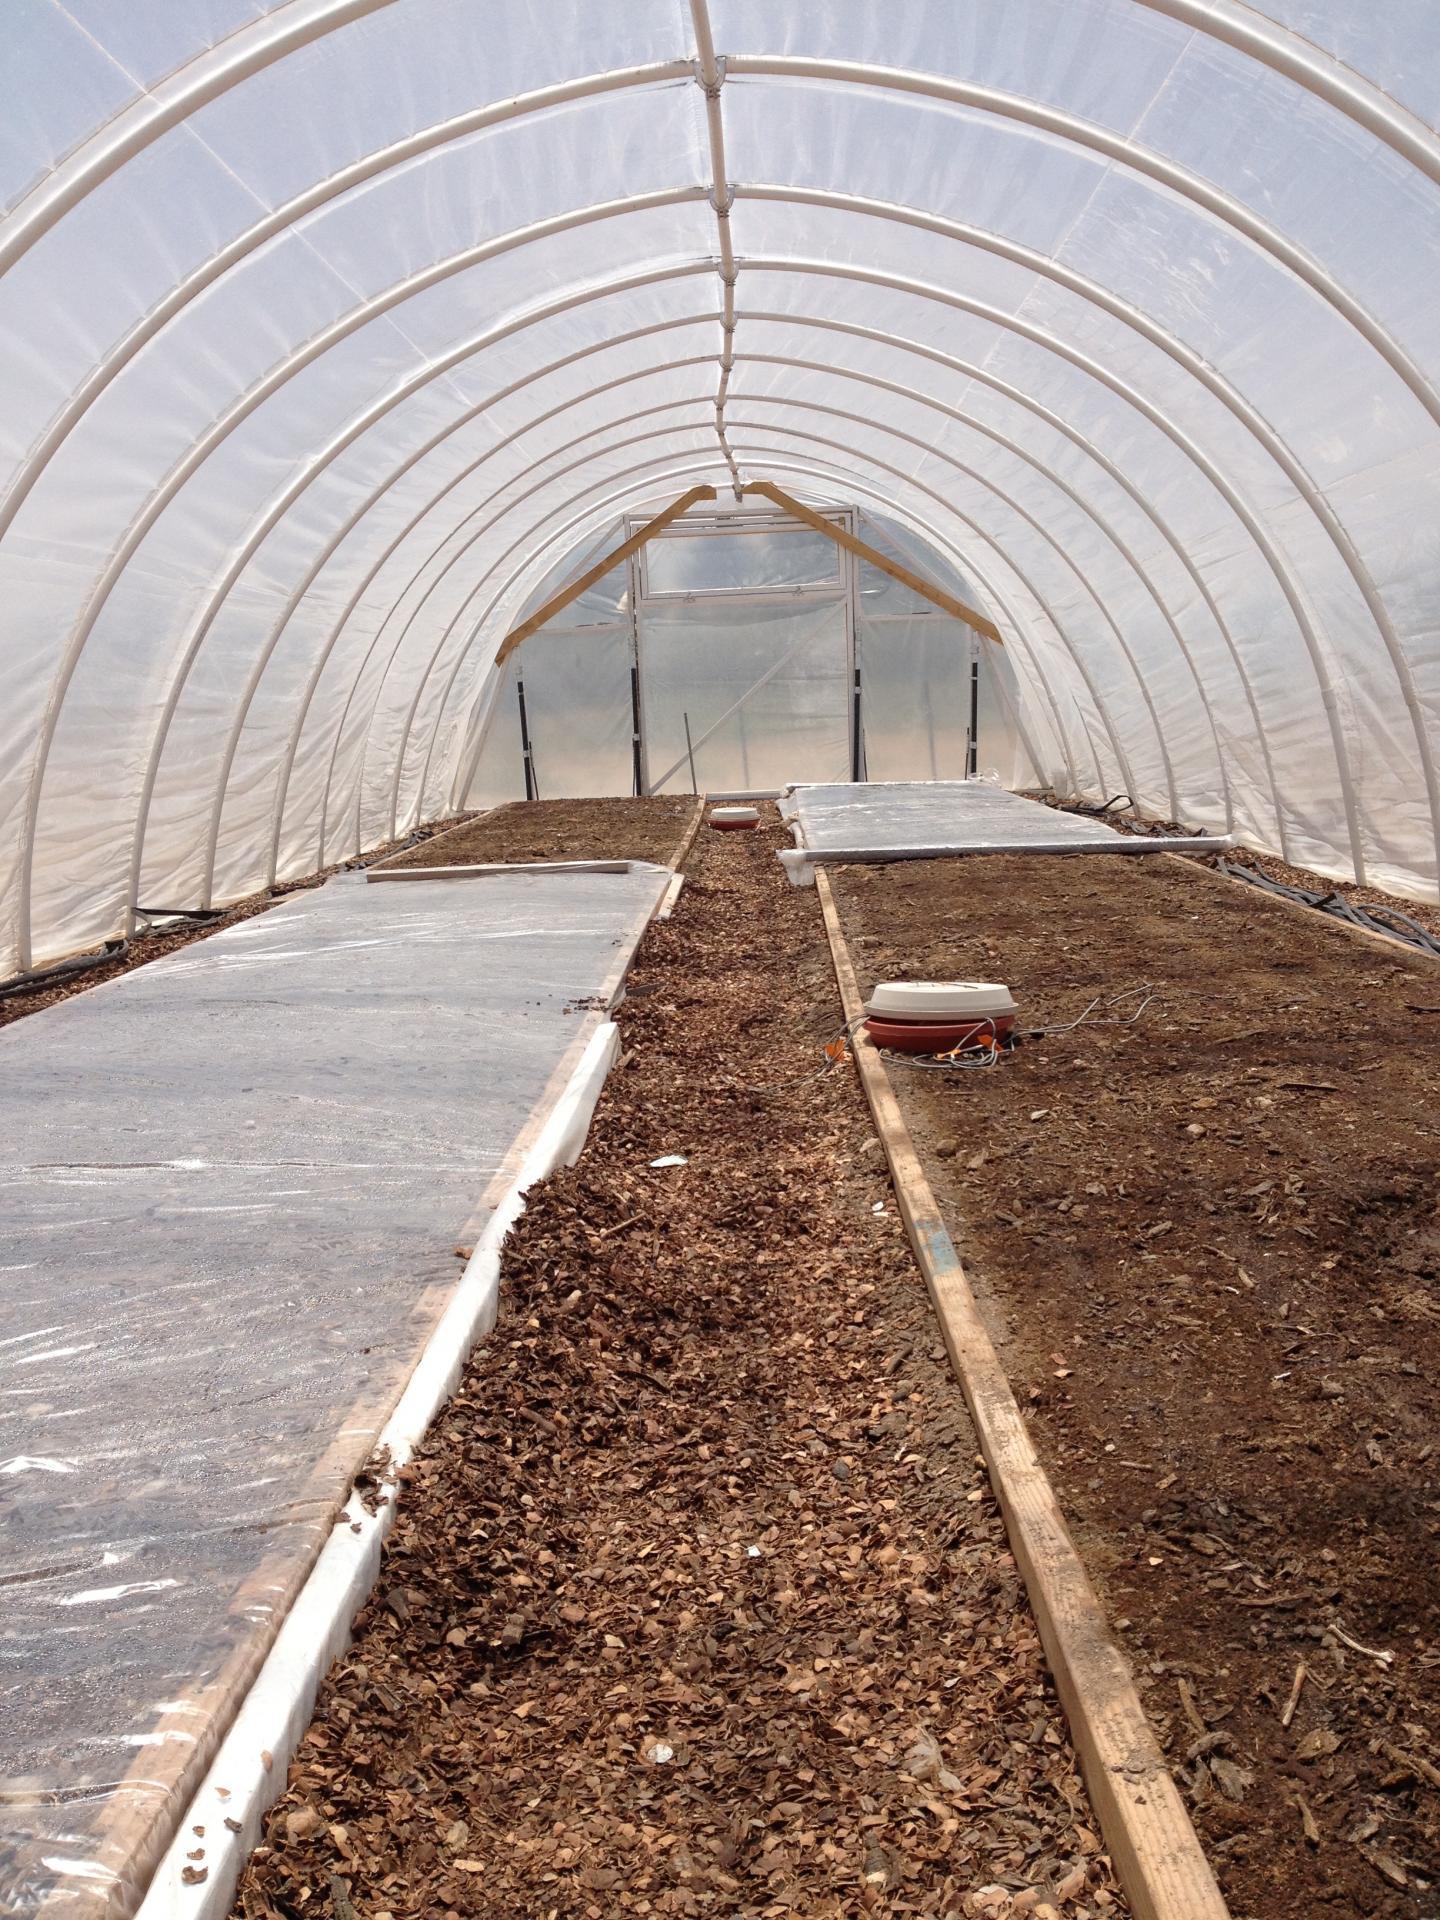 Polyethylene mulch, glazing create optimal conditions for soil solarization